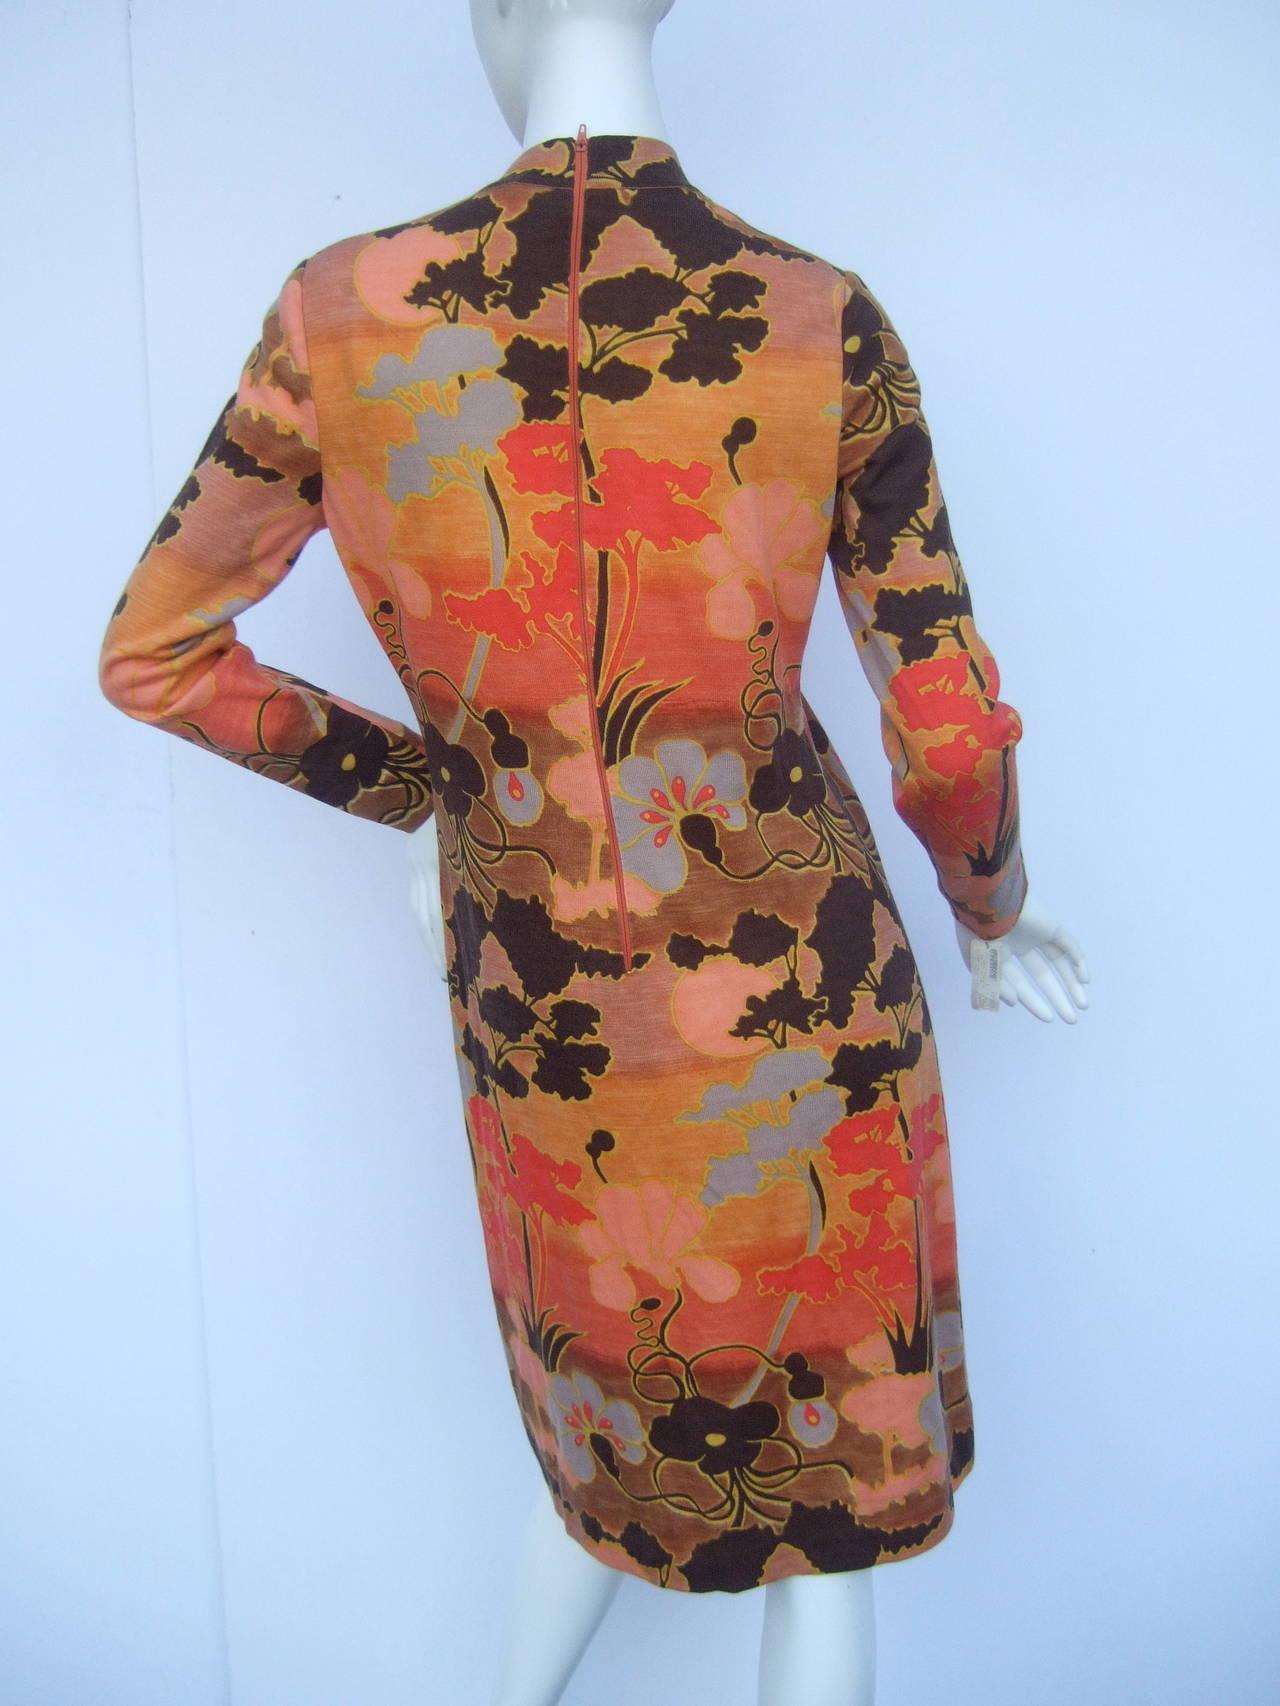 Italian Floral Print Merino Wool Knit Dress c 1970s For Sale 2